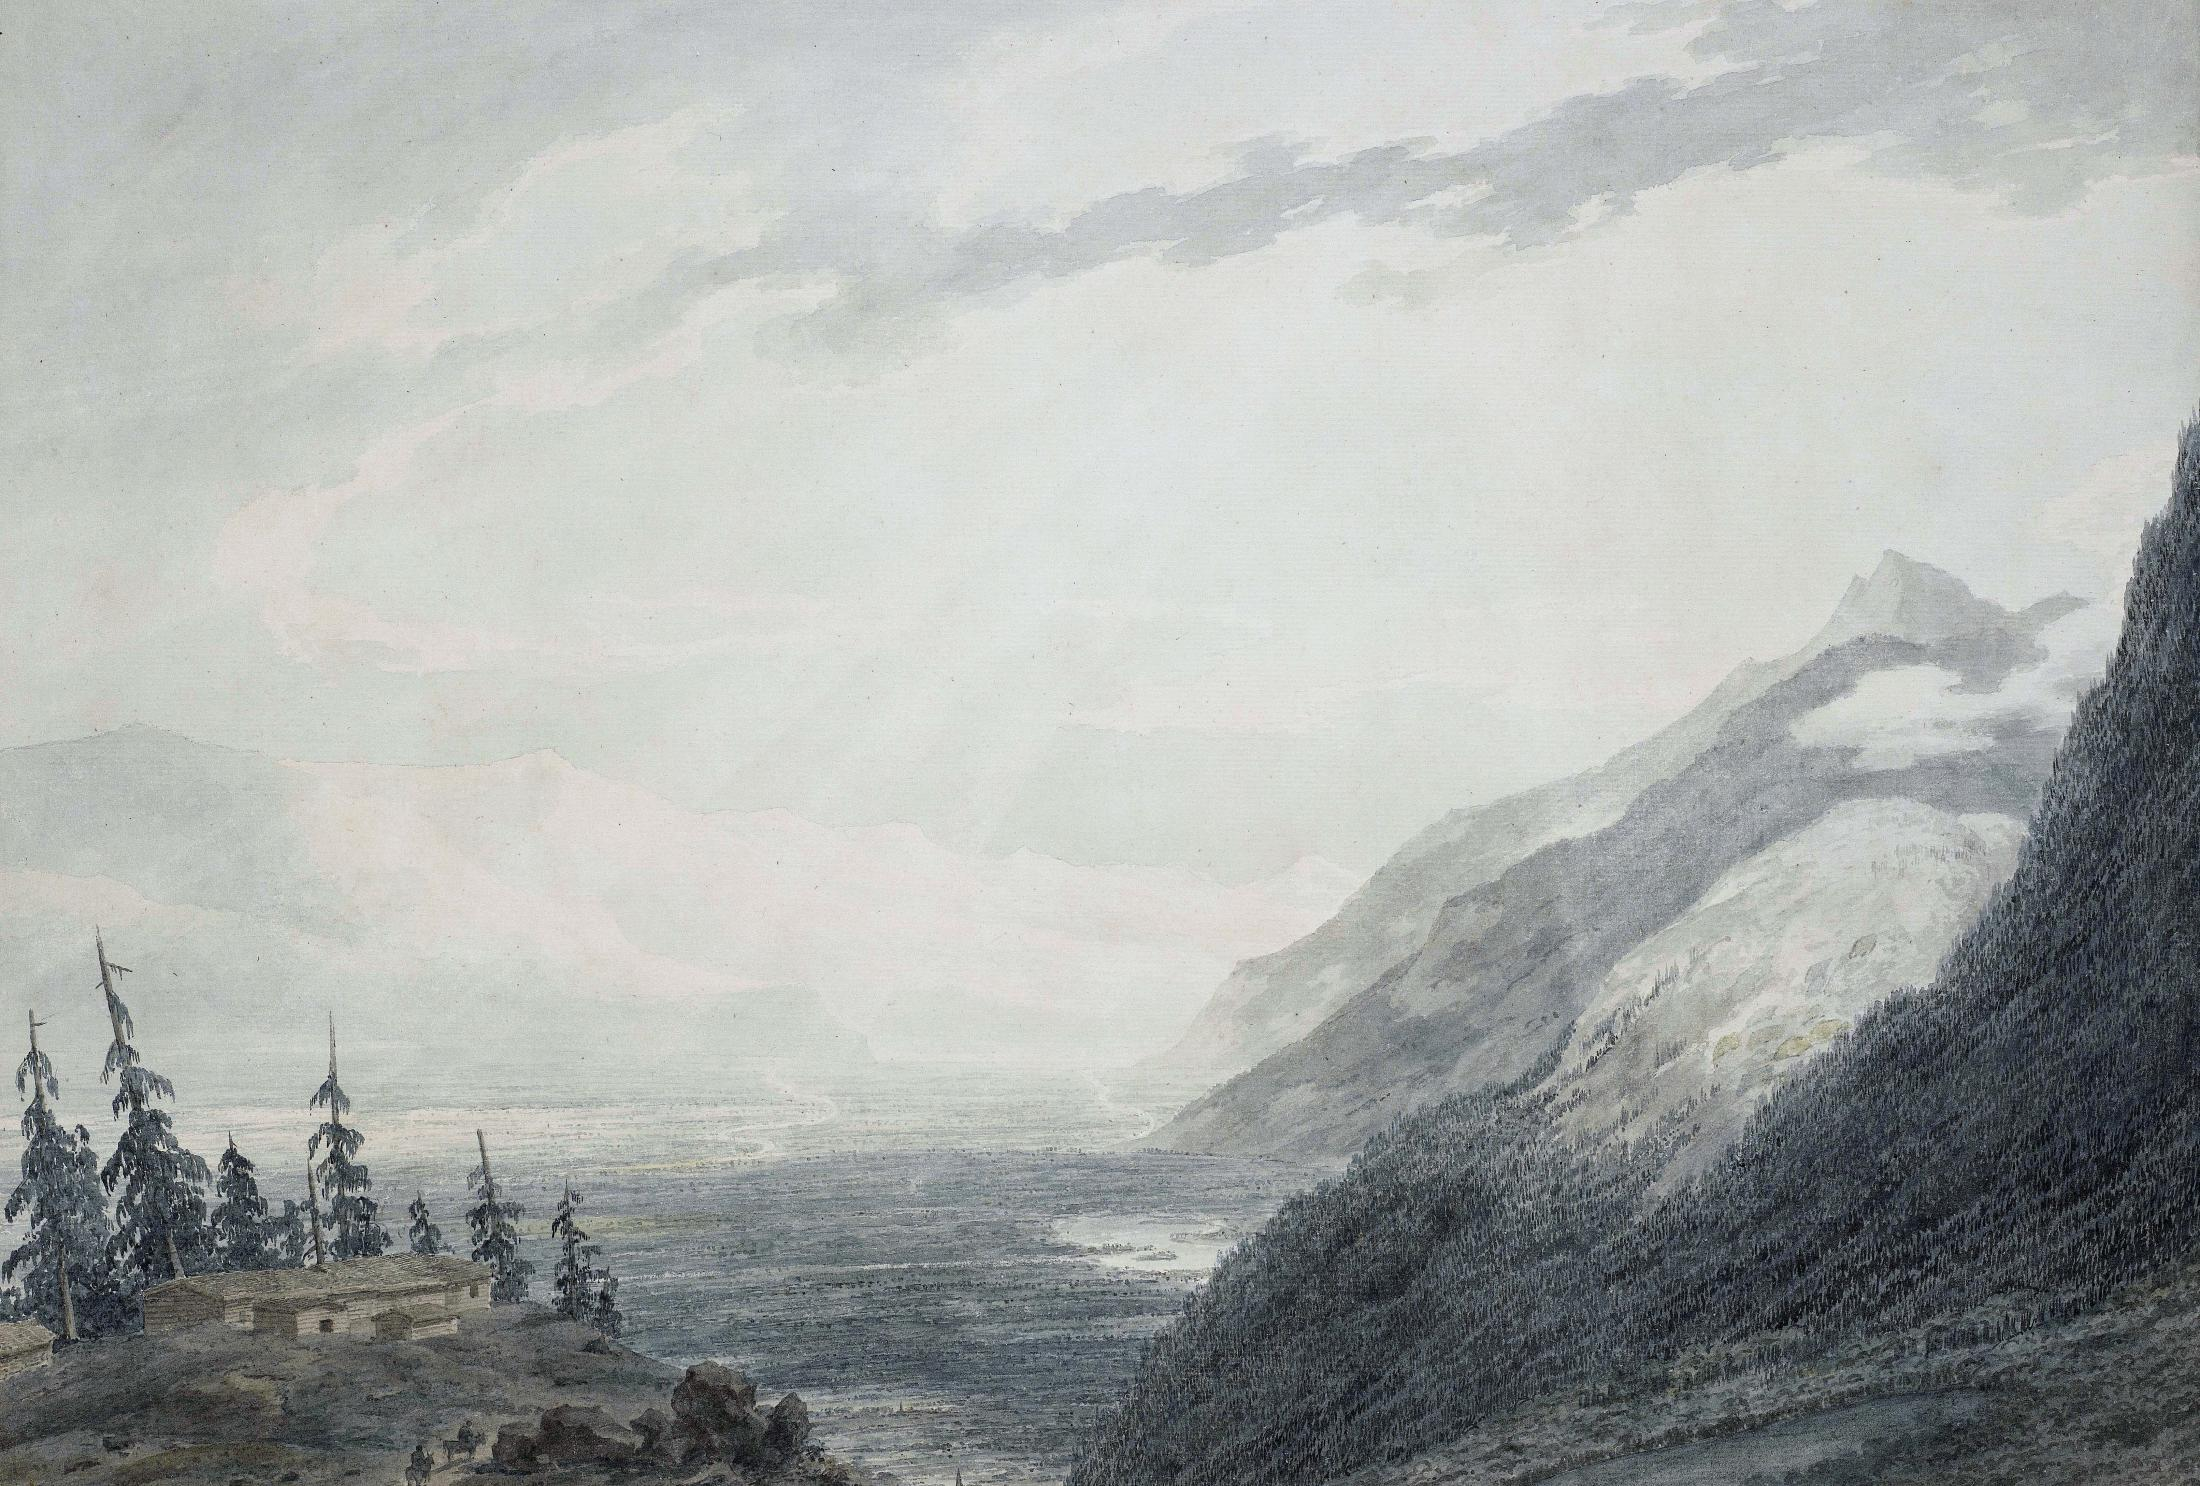 The Approach to Martigny, Rhone Valley, Valais